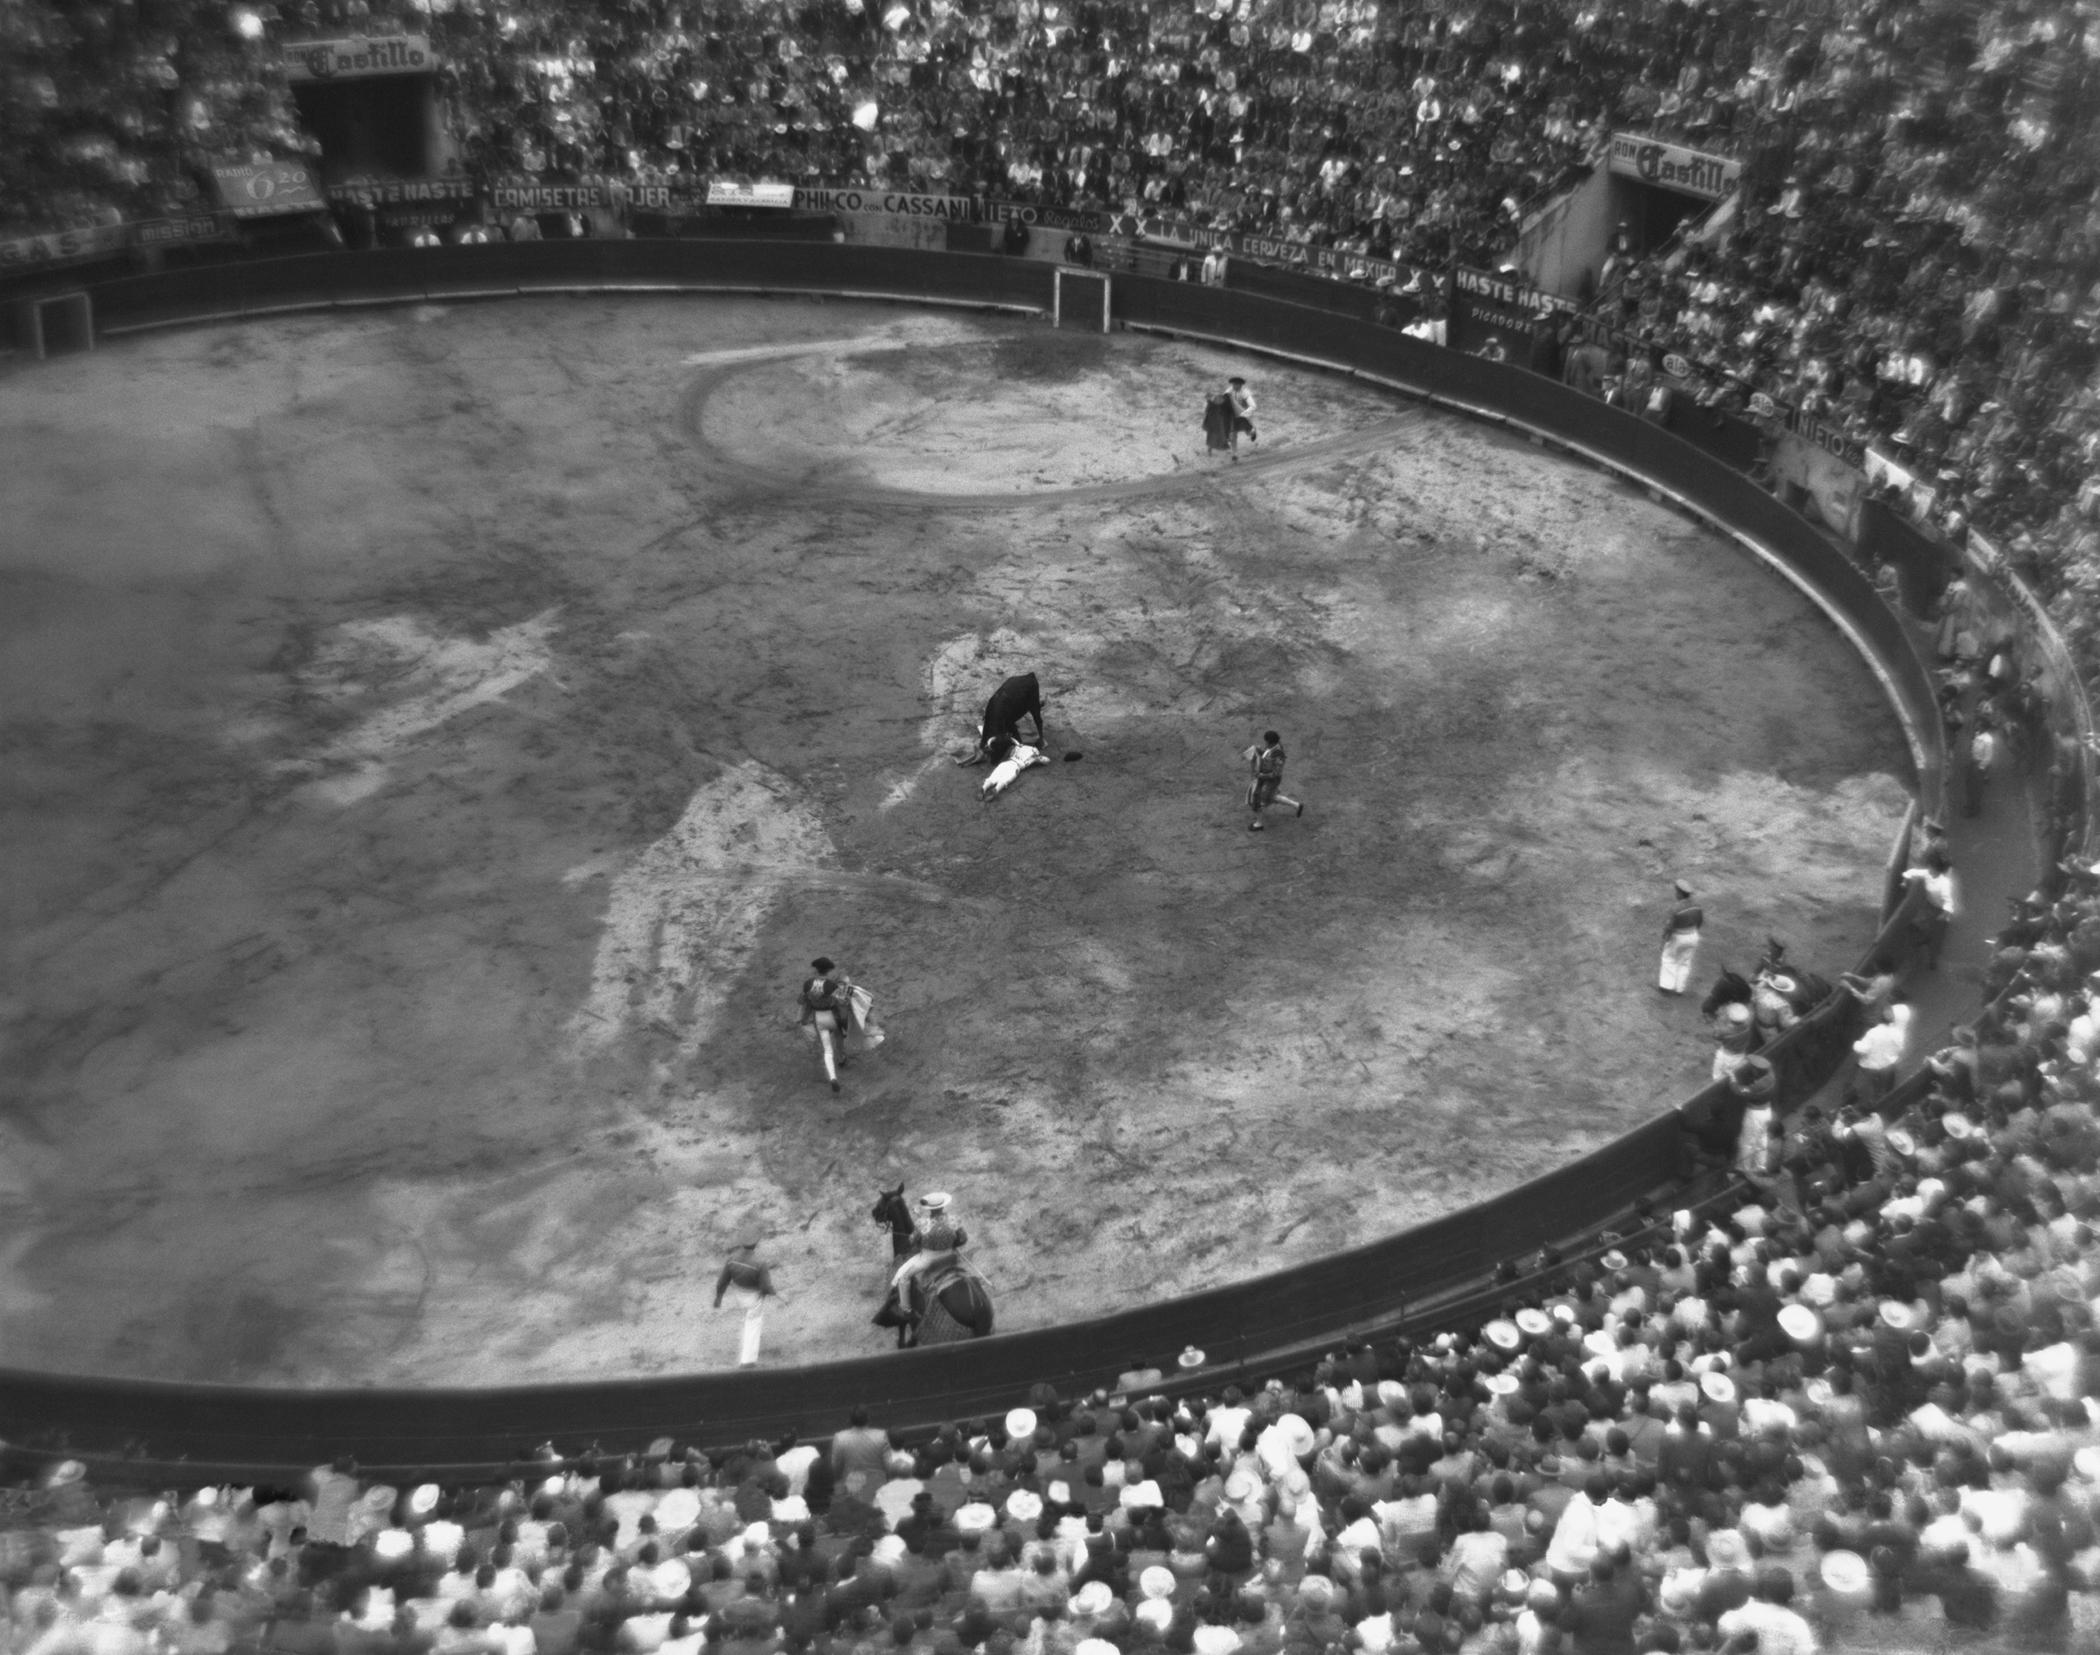 BULLFIGHT - 1957